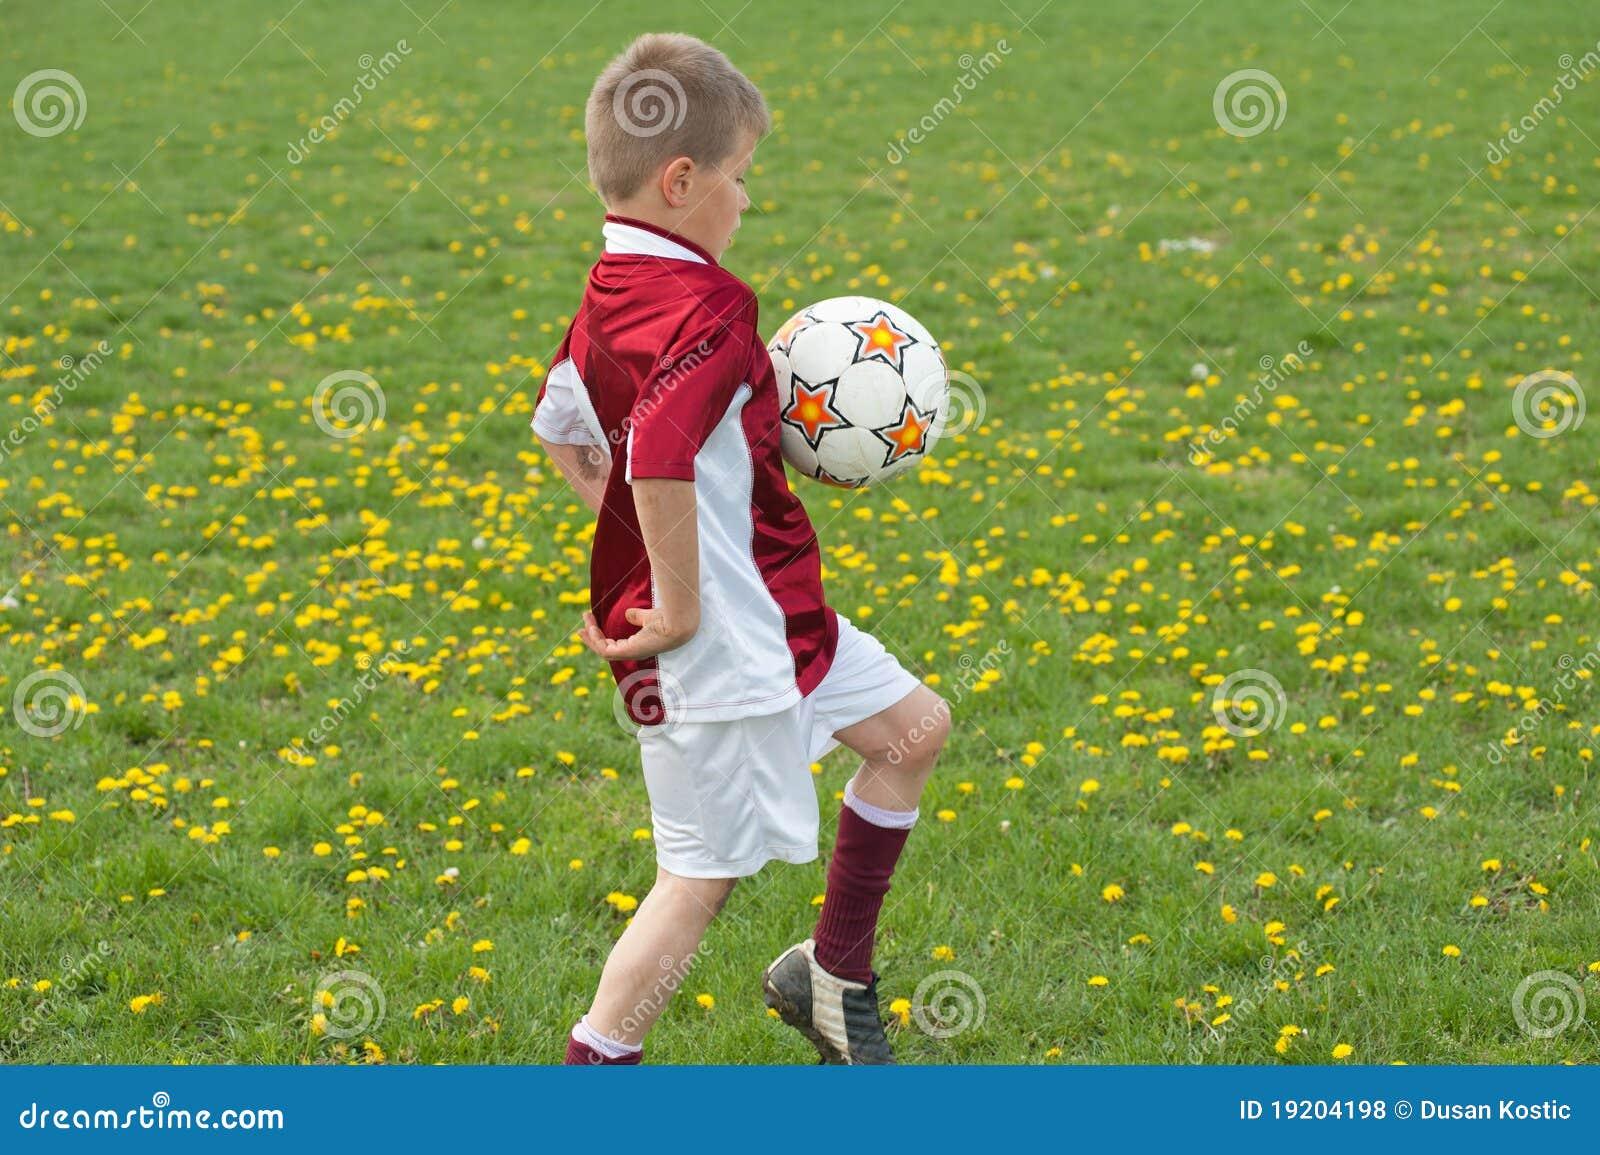 тренировка футбола